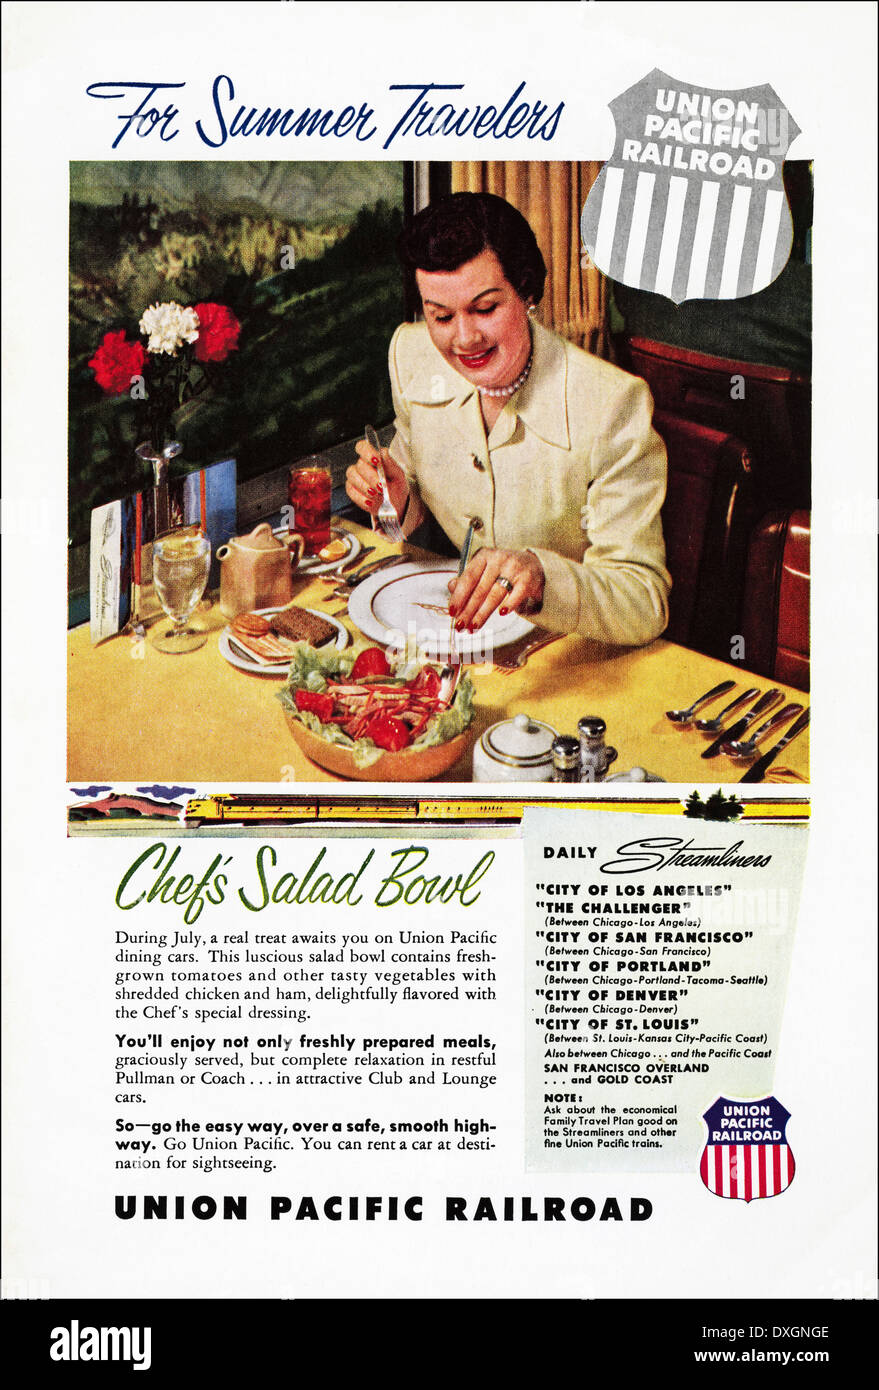 1950s advertisement for Union Pacific Railroad advert in American magazine circa 1954 - Stock Image